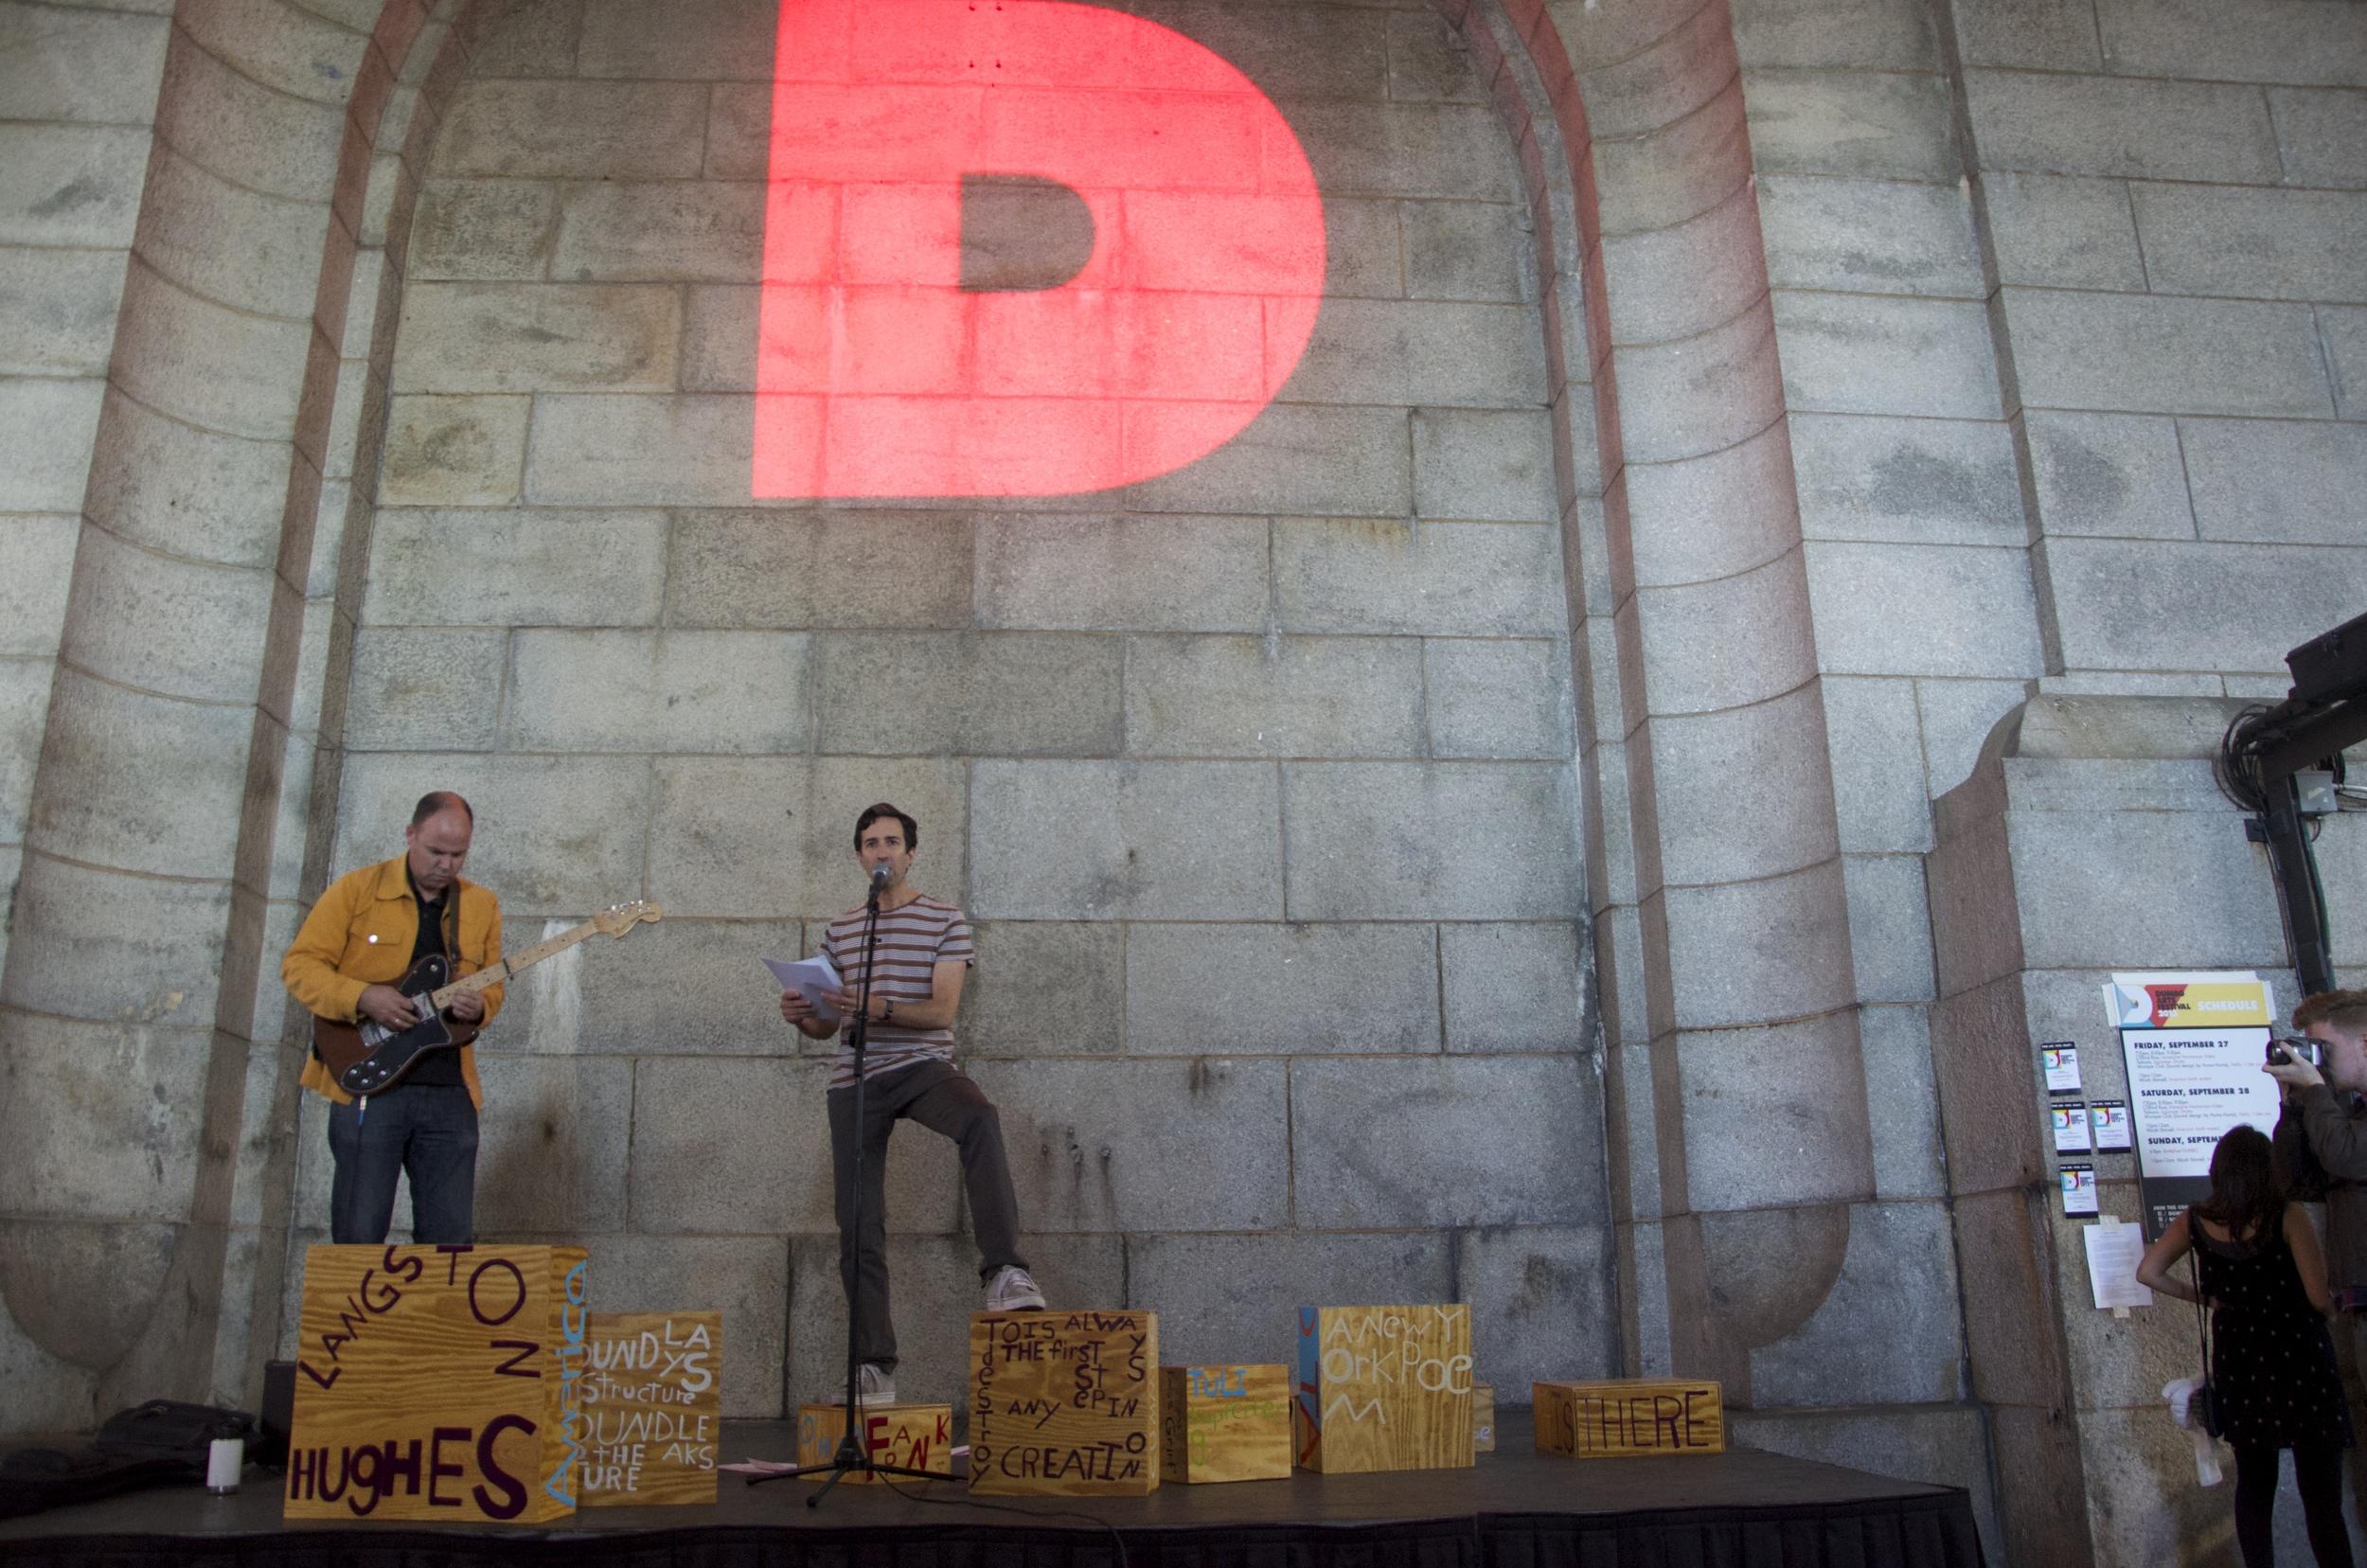 Poet Sculpture, DUMBO Arts Festival, David Grubbs, Vincent Katz, Brooklyn, NY 2013.jpg